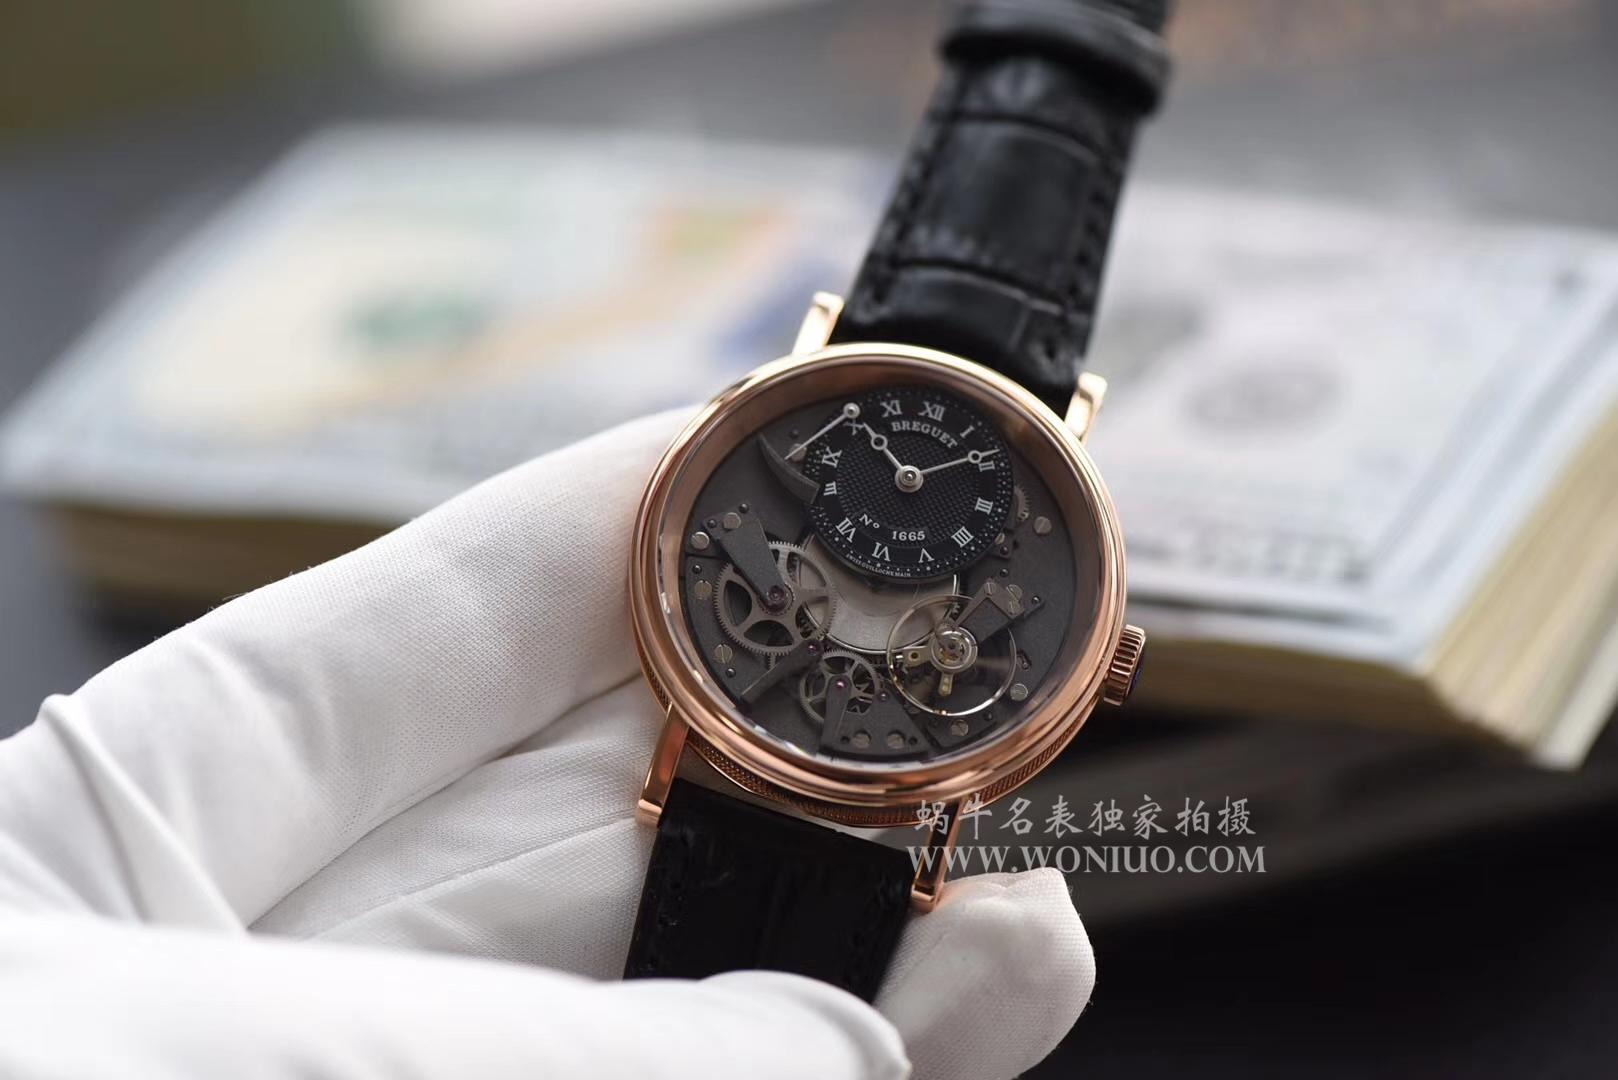 【SF一比一超A高精仿手表】宝玑传世系列7057BR/G9/9W6腕表